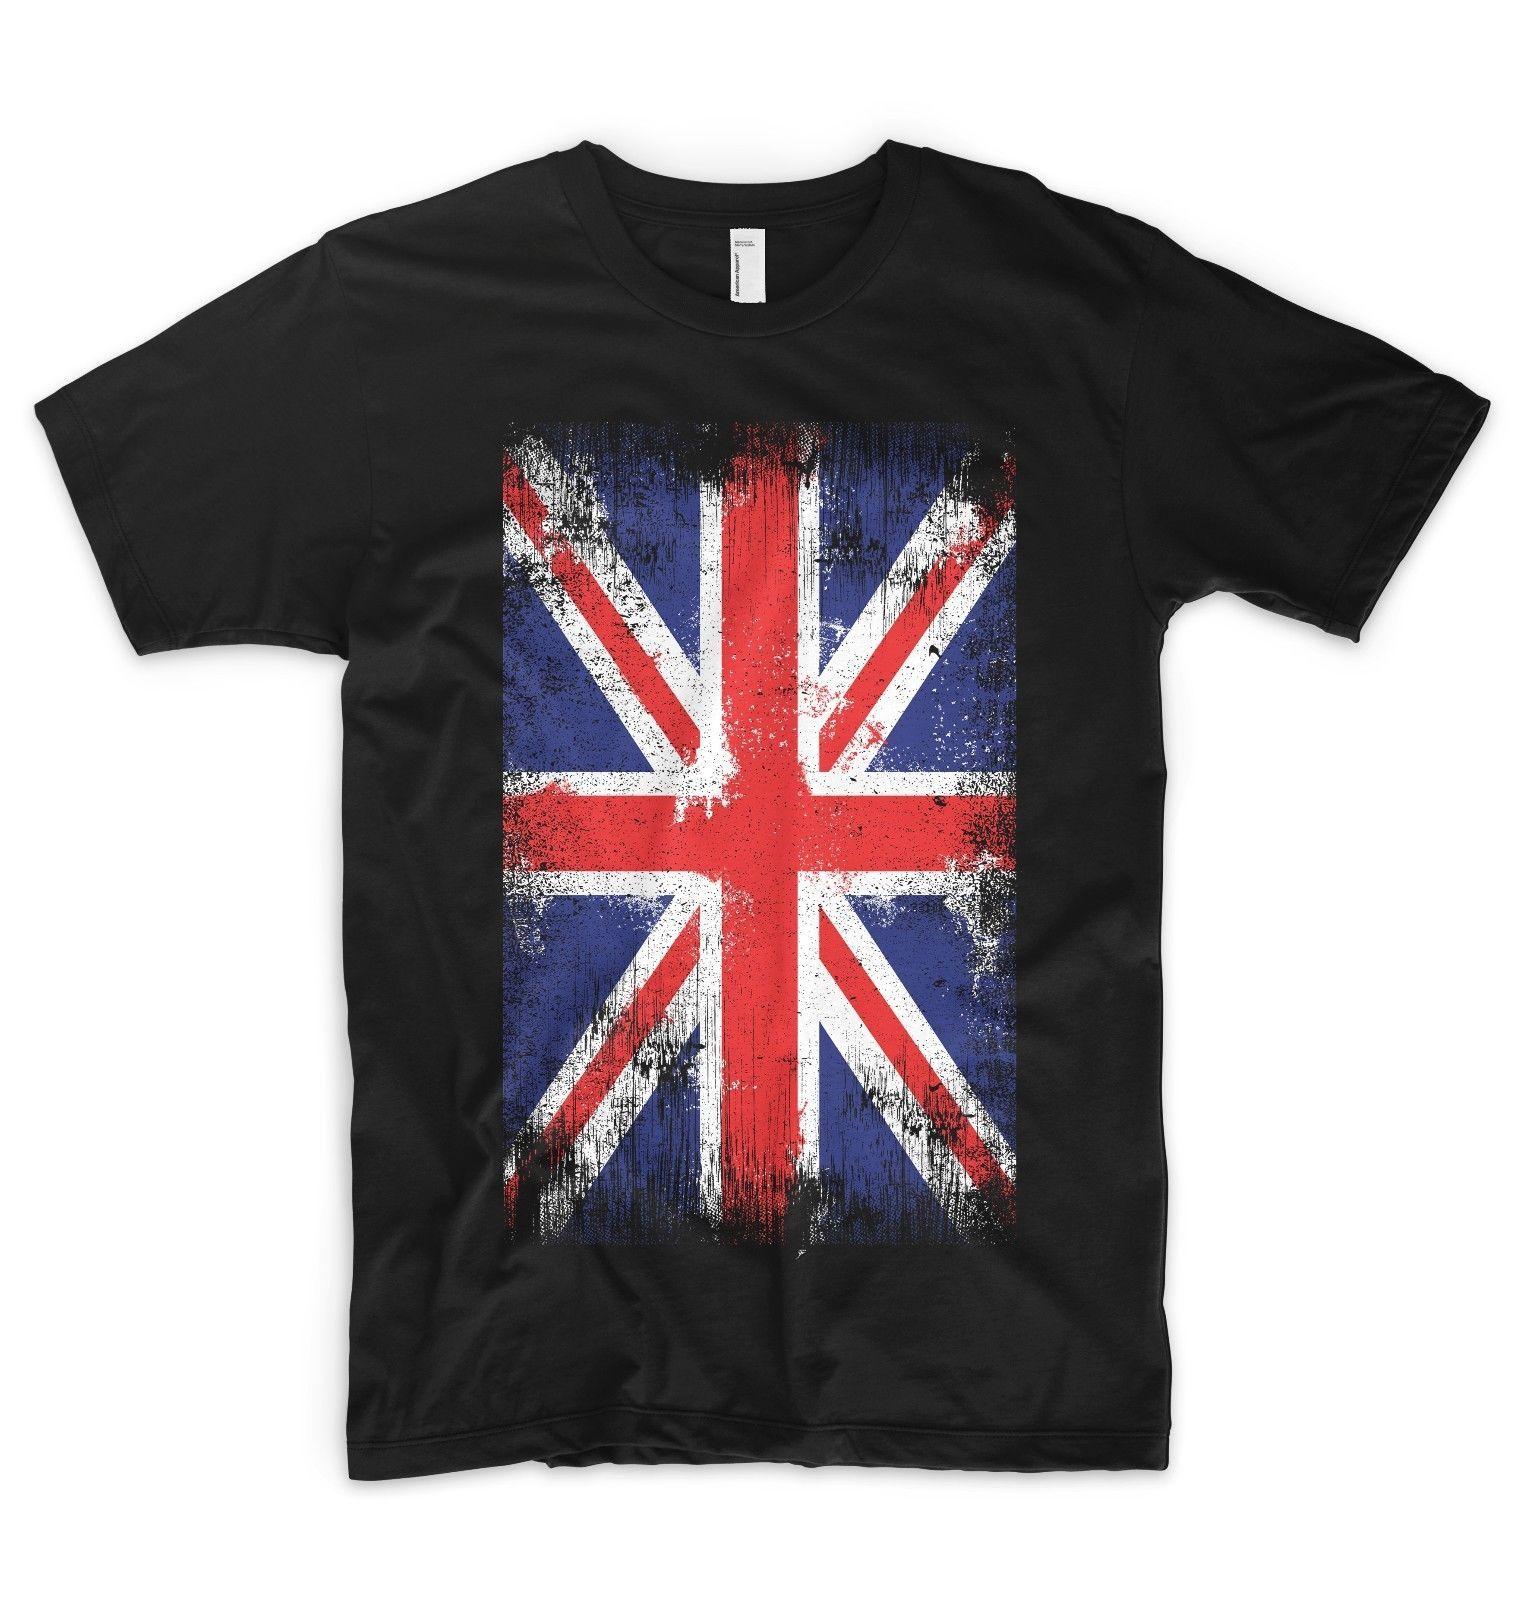 5003a6207 Details Zu Union Jack T Shirt UK British Flag Great Britain United ...